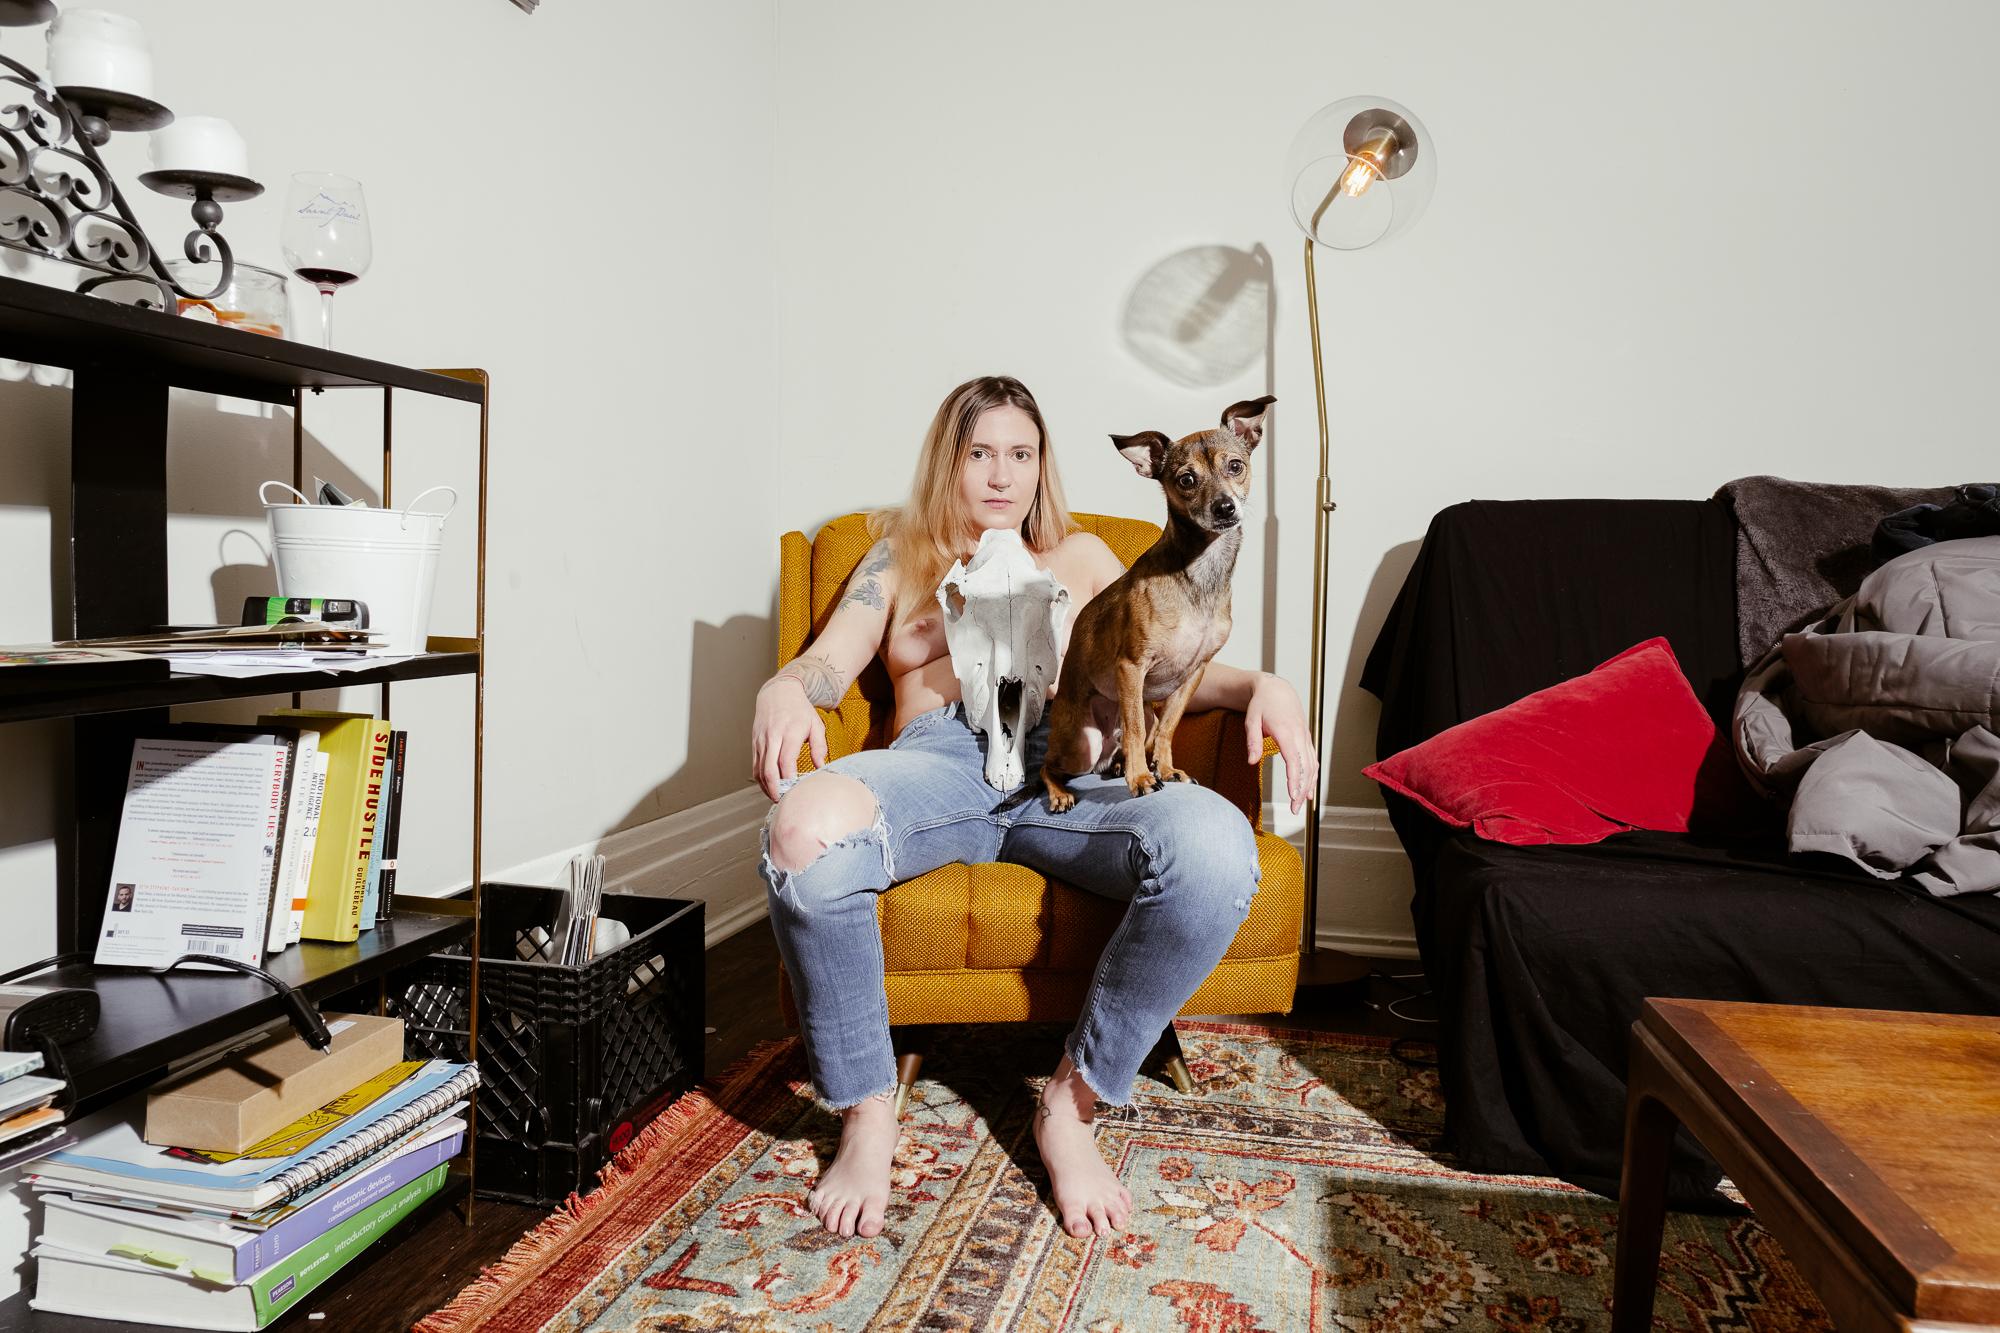 20181128-Brandi-Hannah-apartment-X-T2-0157-Edit.jpg